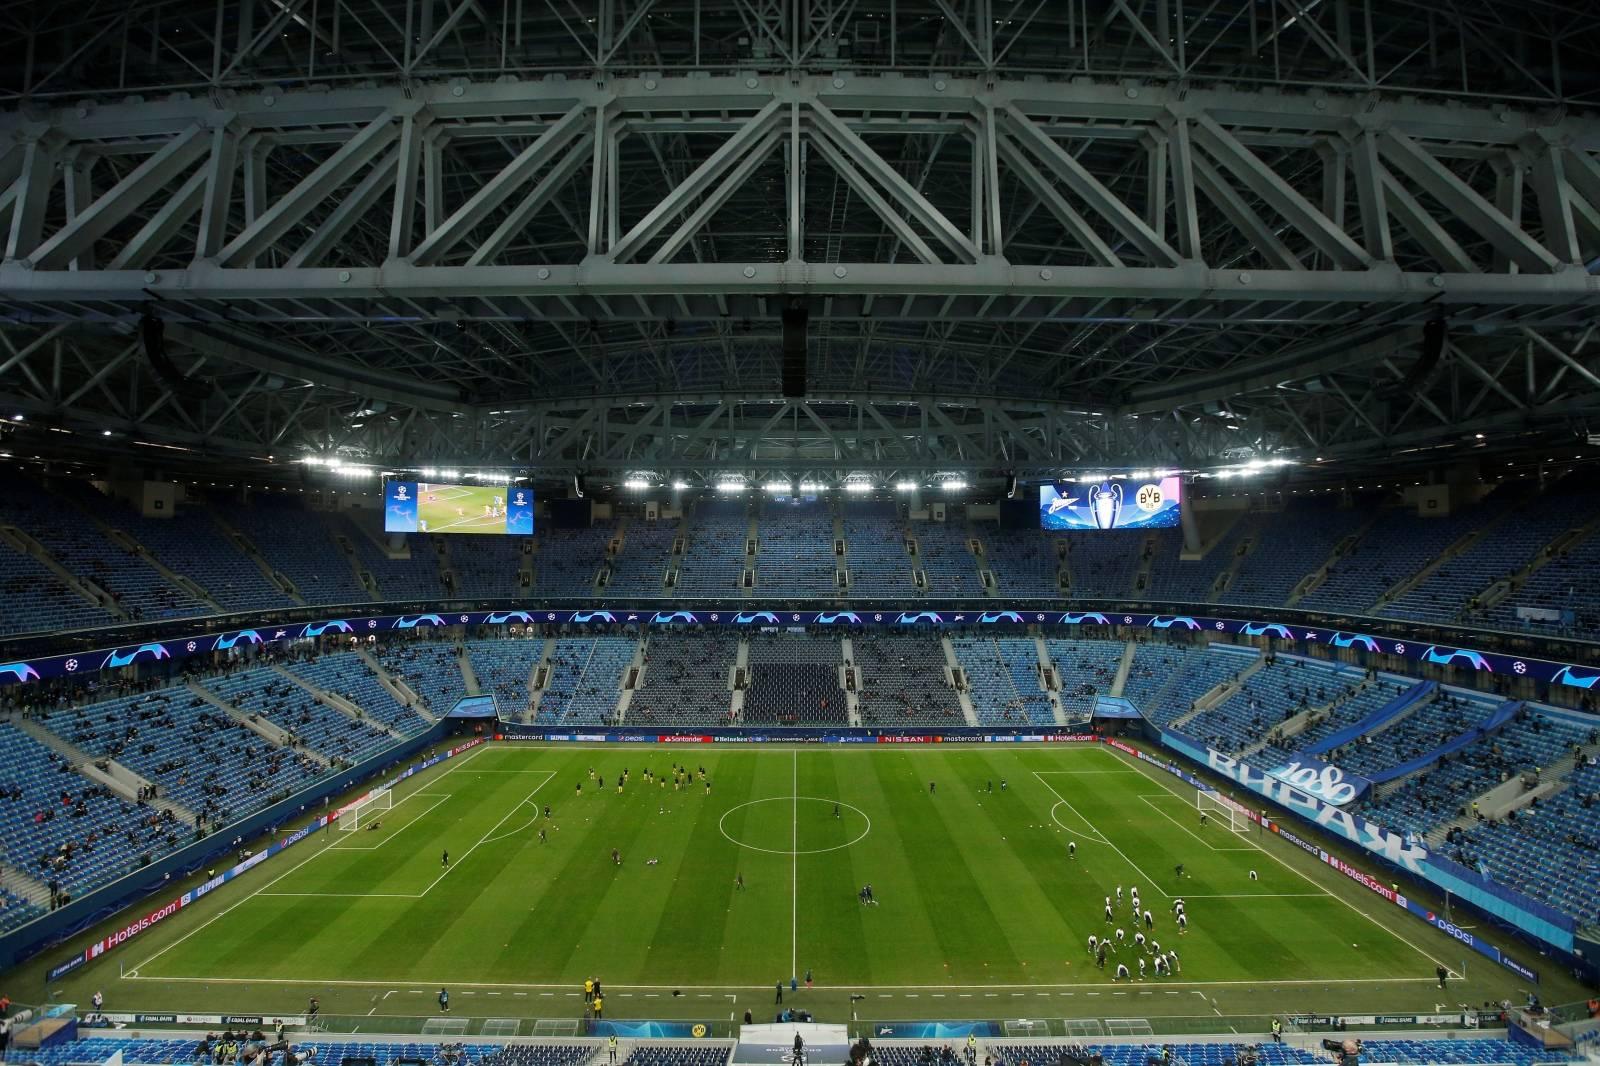 FILE PHOTO: Champions League - Group F - Zenit Saint Petersburg v Borussia Dortmund